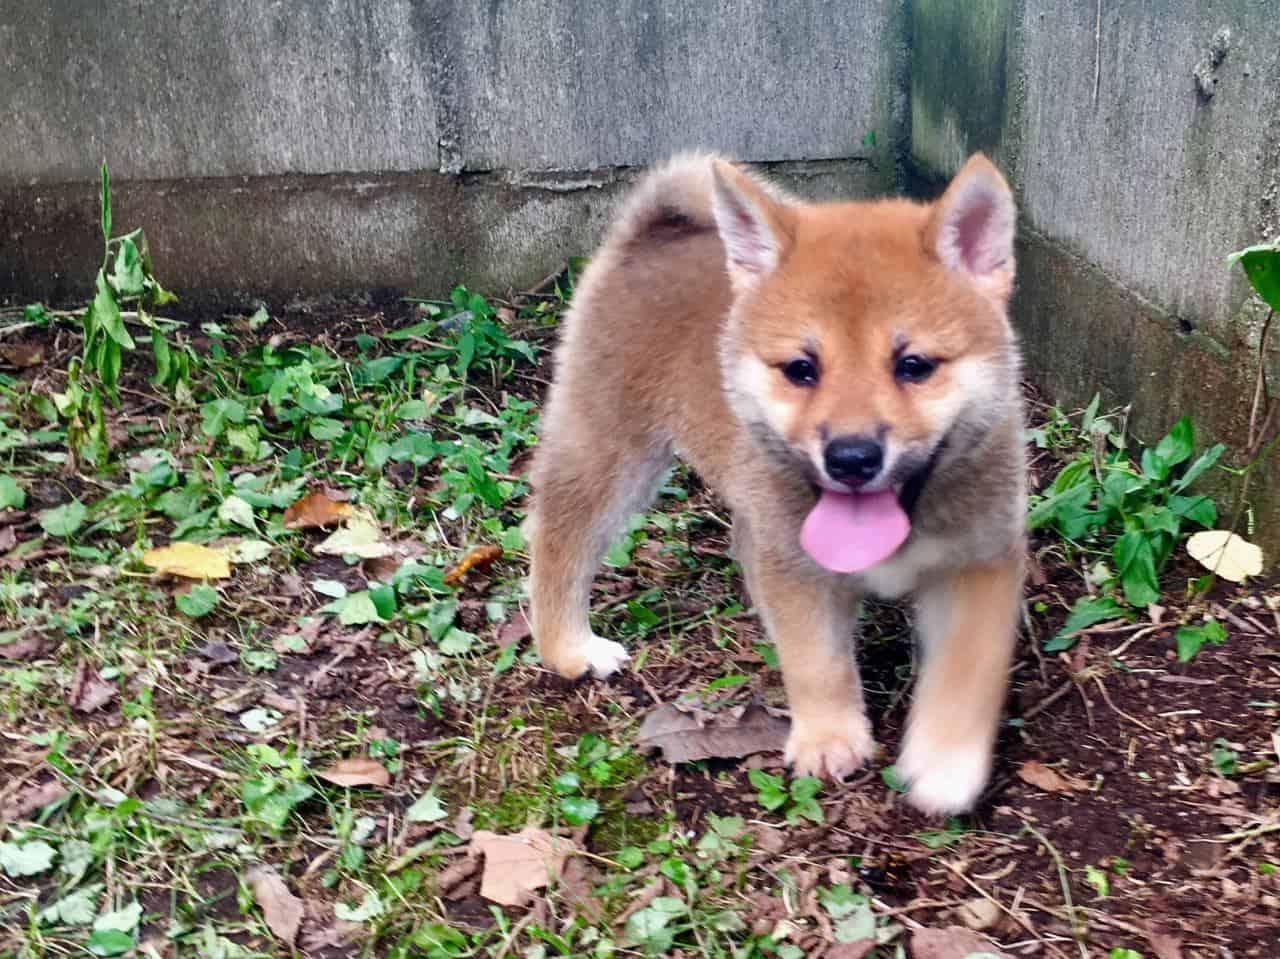 Shiba Inu: Japan's Cutest National Treasure